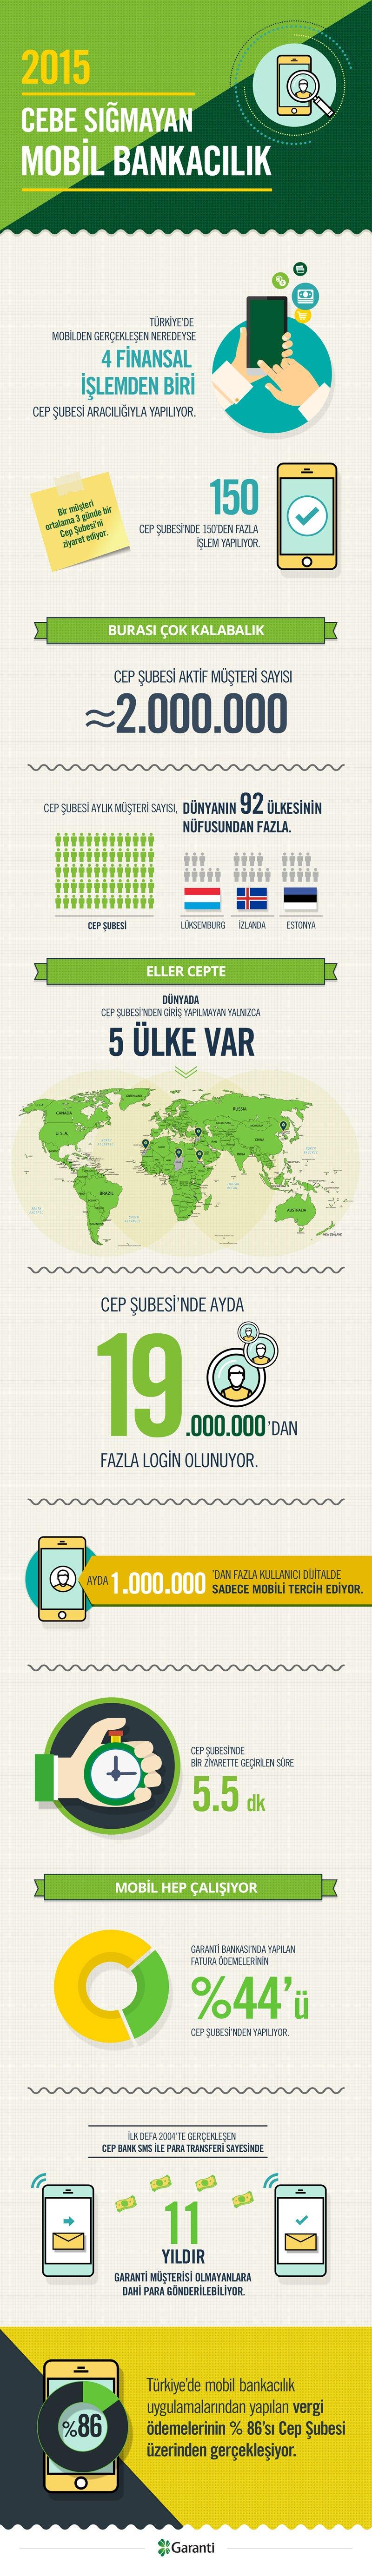 garanti-infografik-800